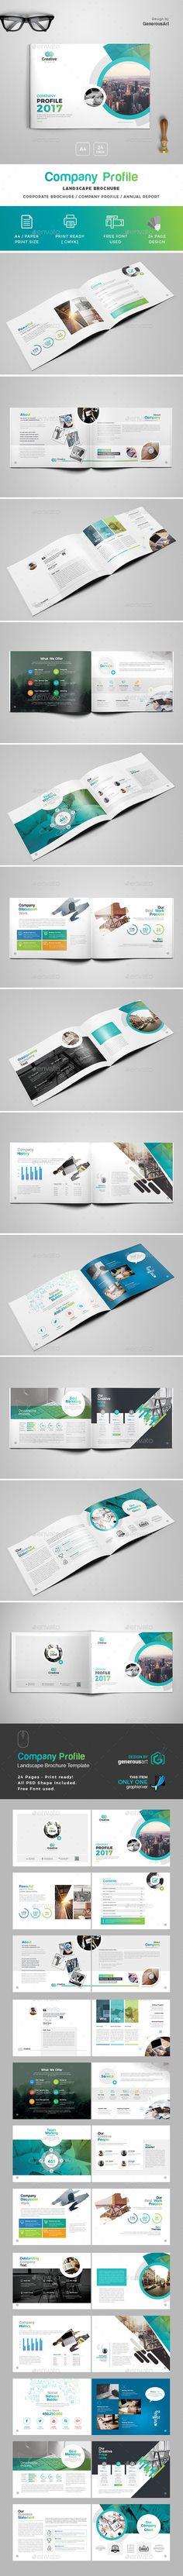 Company Profile Landscape Brochure Template PSD